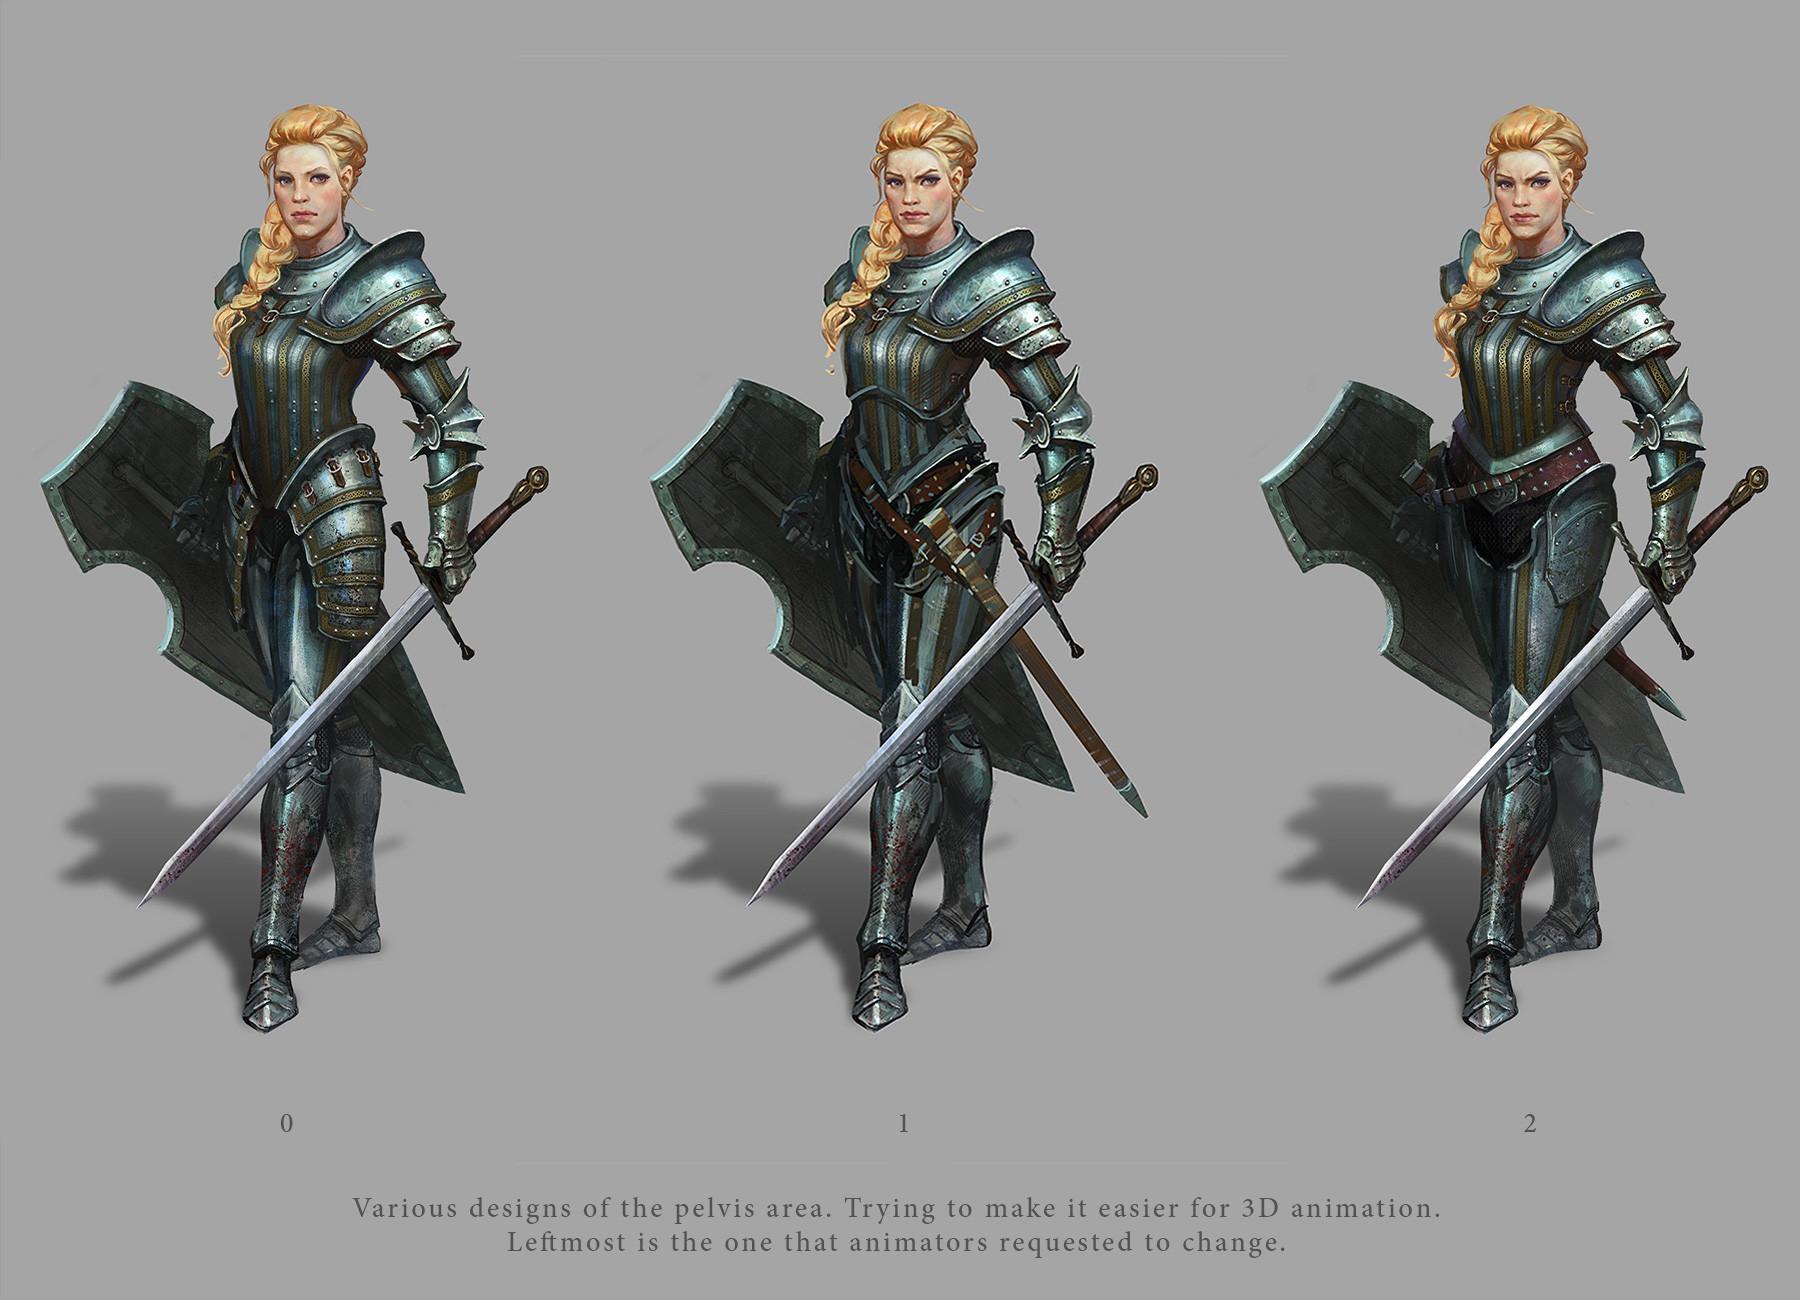 Pavel goloviy elora pelvis design variants